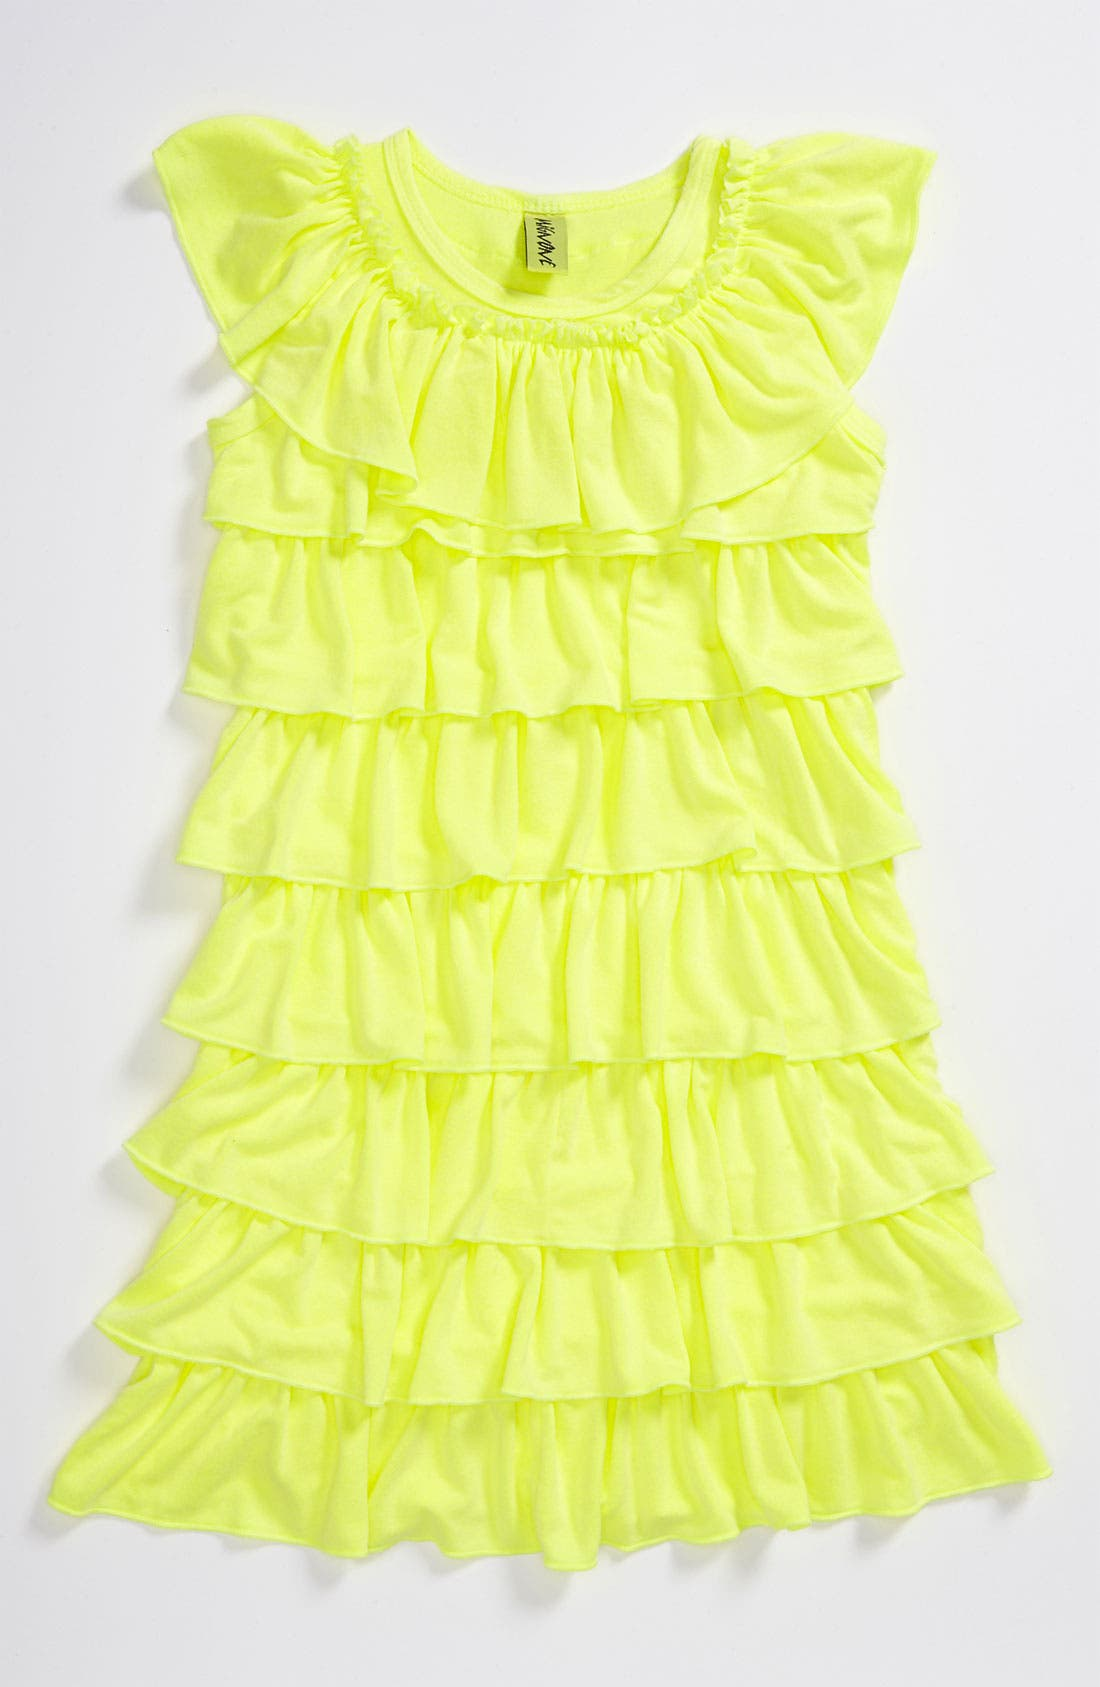 Alternate Image 1 Selected - Mignone Allover Ruffle Dress (Little Girls)